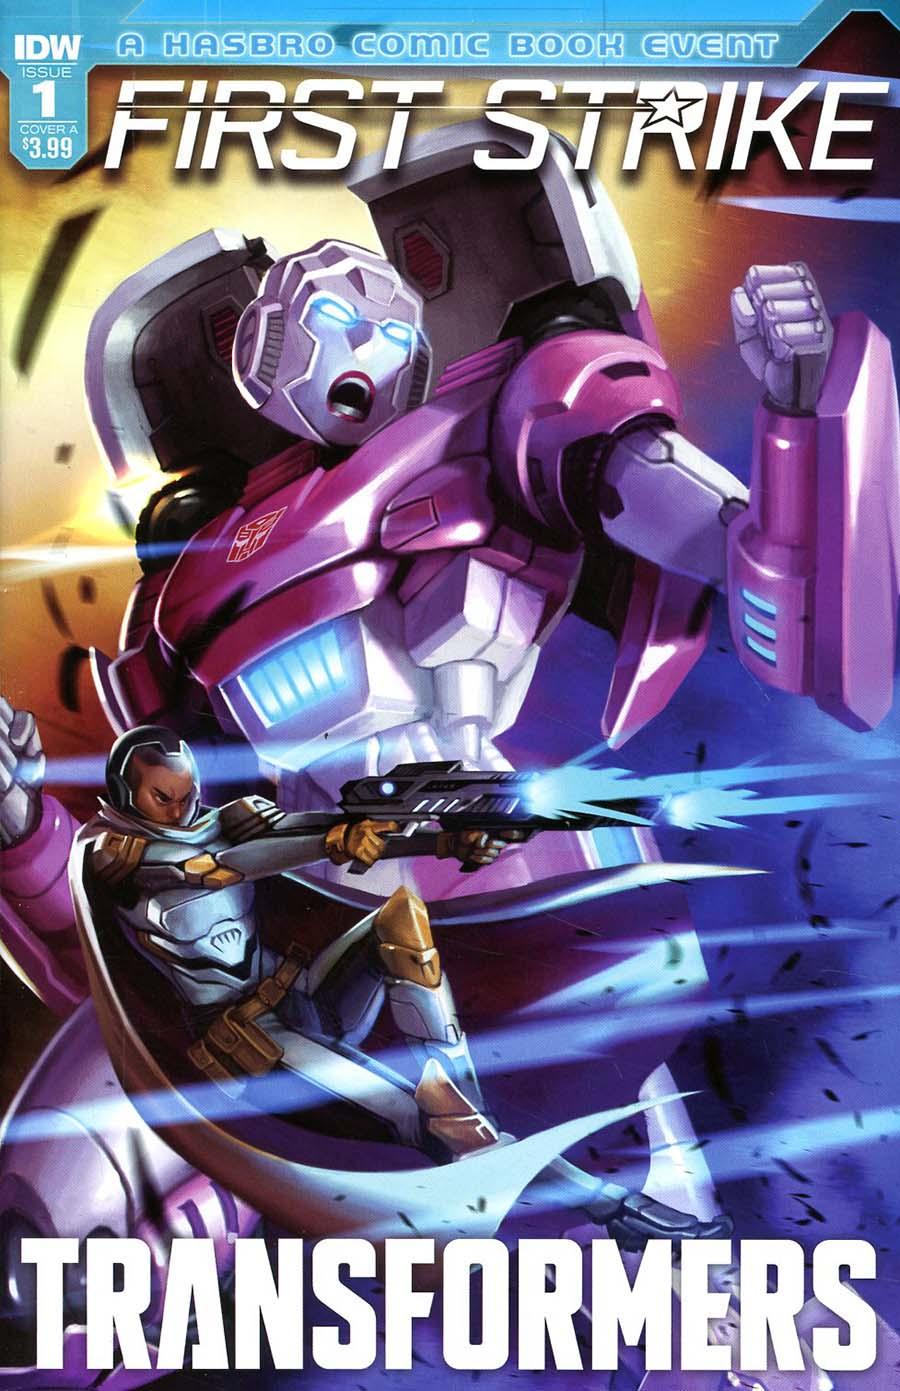 Transformers First Strike #1 Cover A Regular Sara Pitre-Durocher Cover